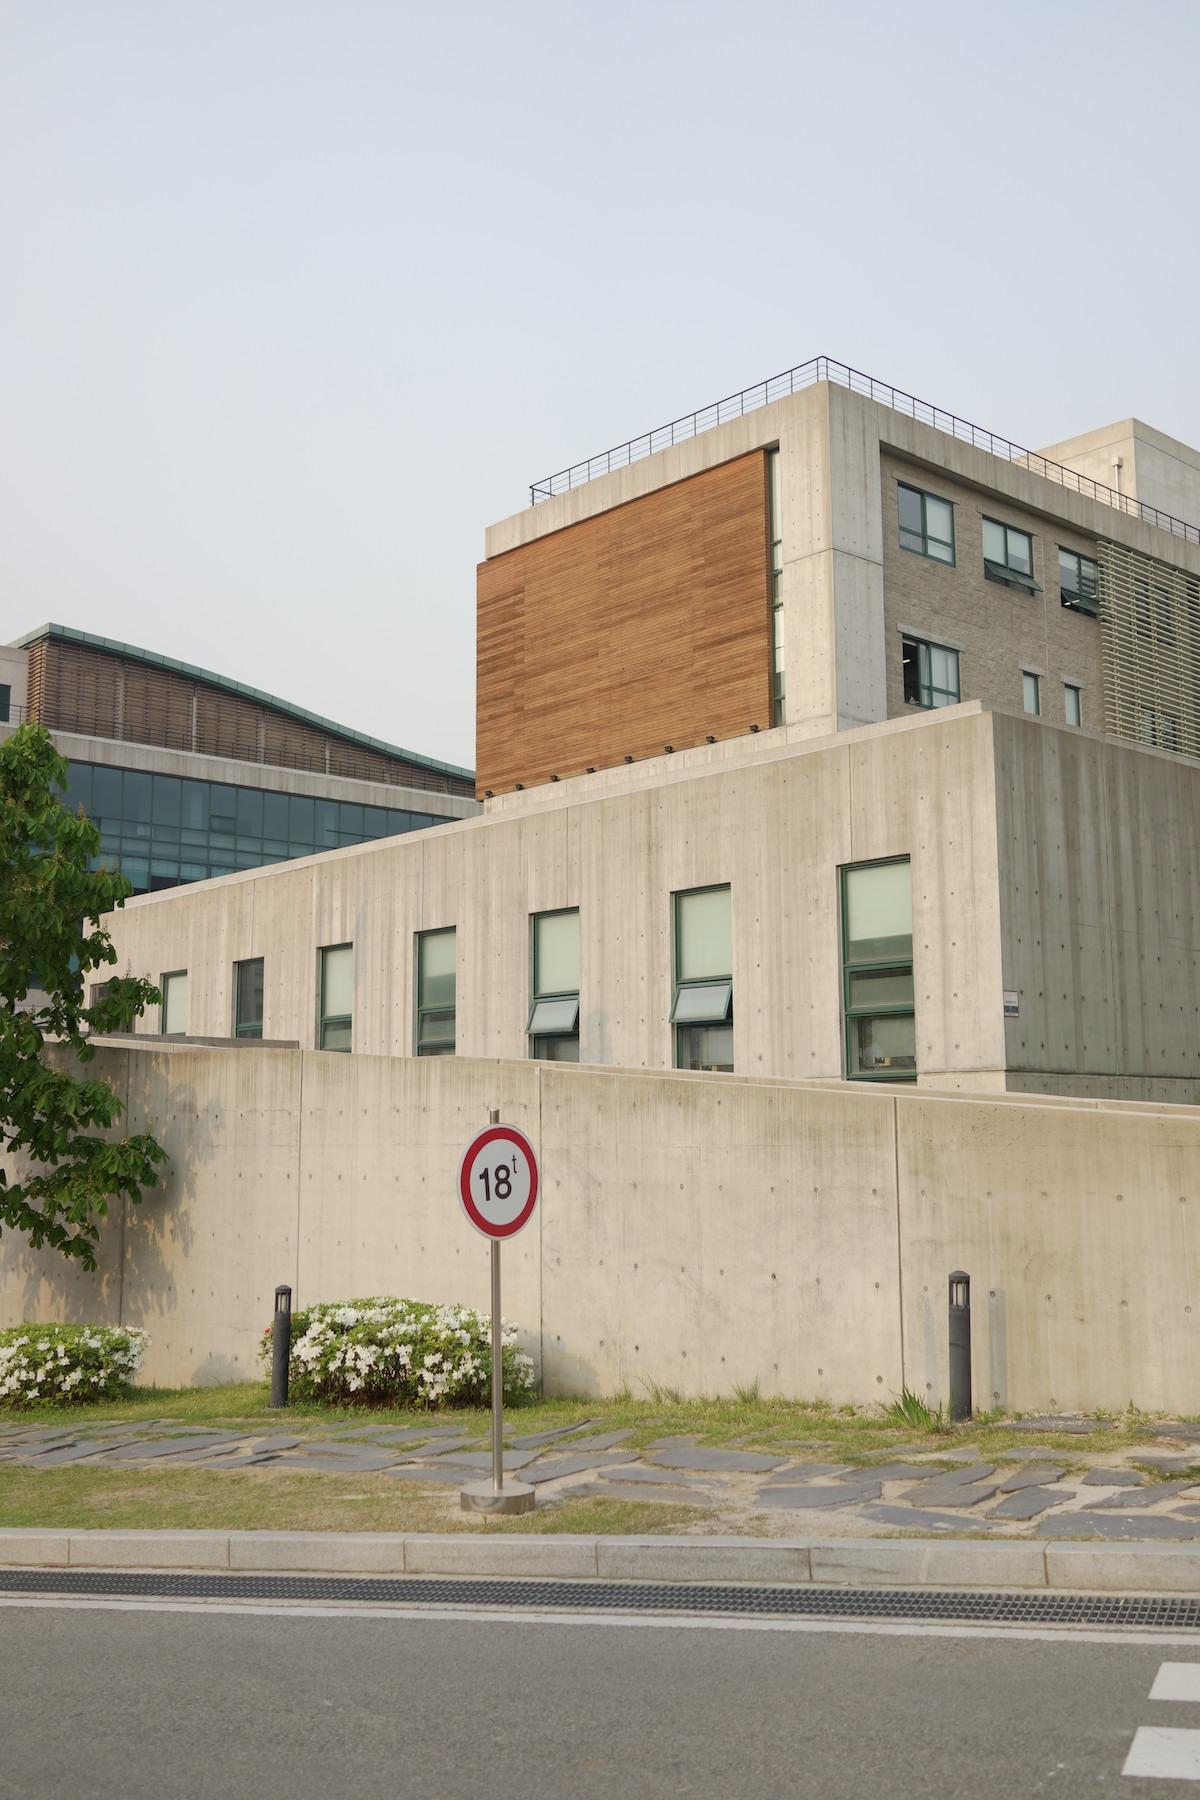 The Korean National University of Arts (한국예술종합학교).